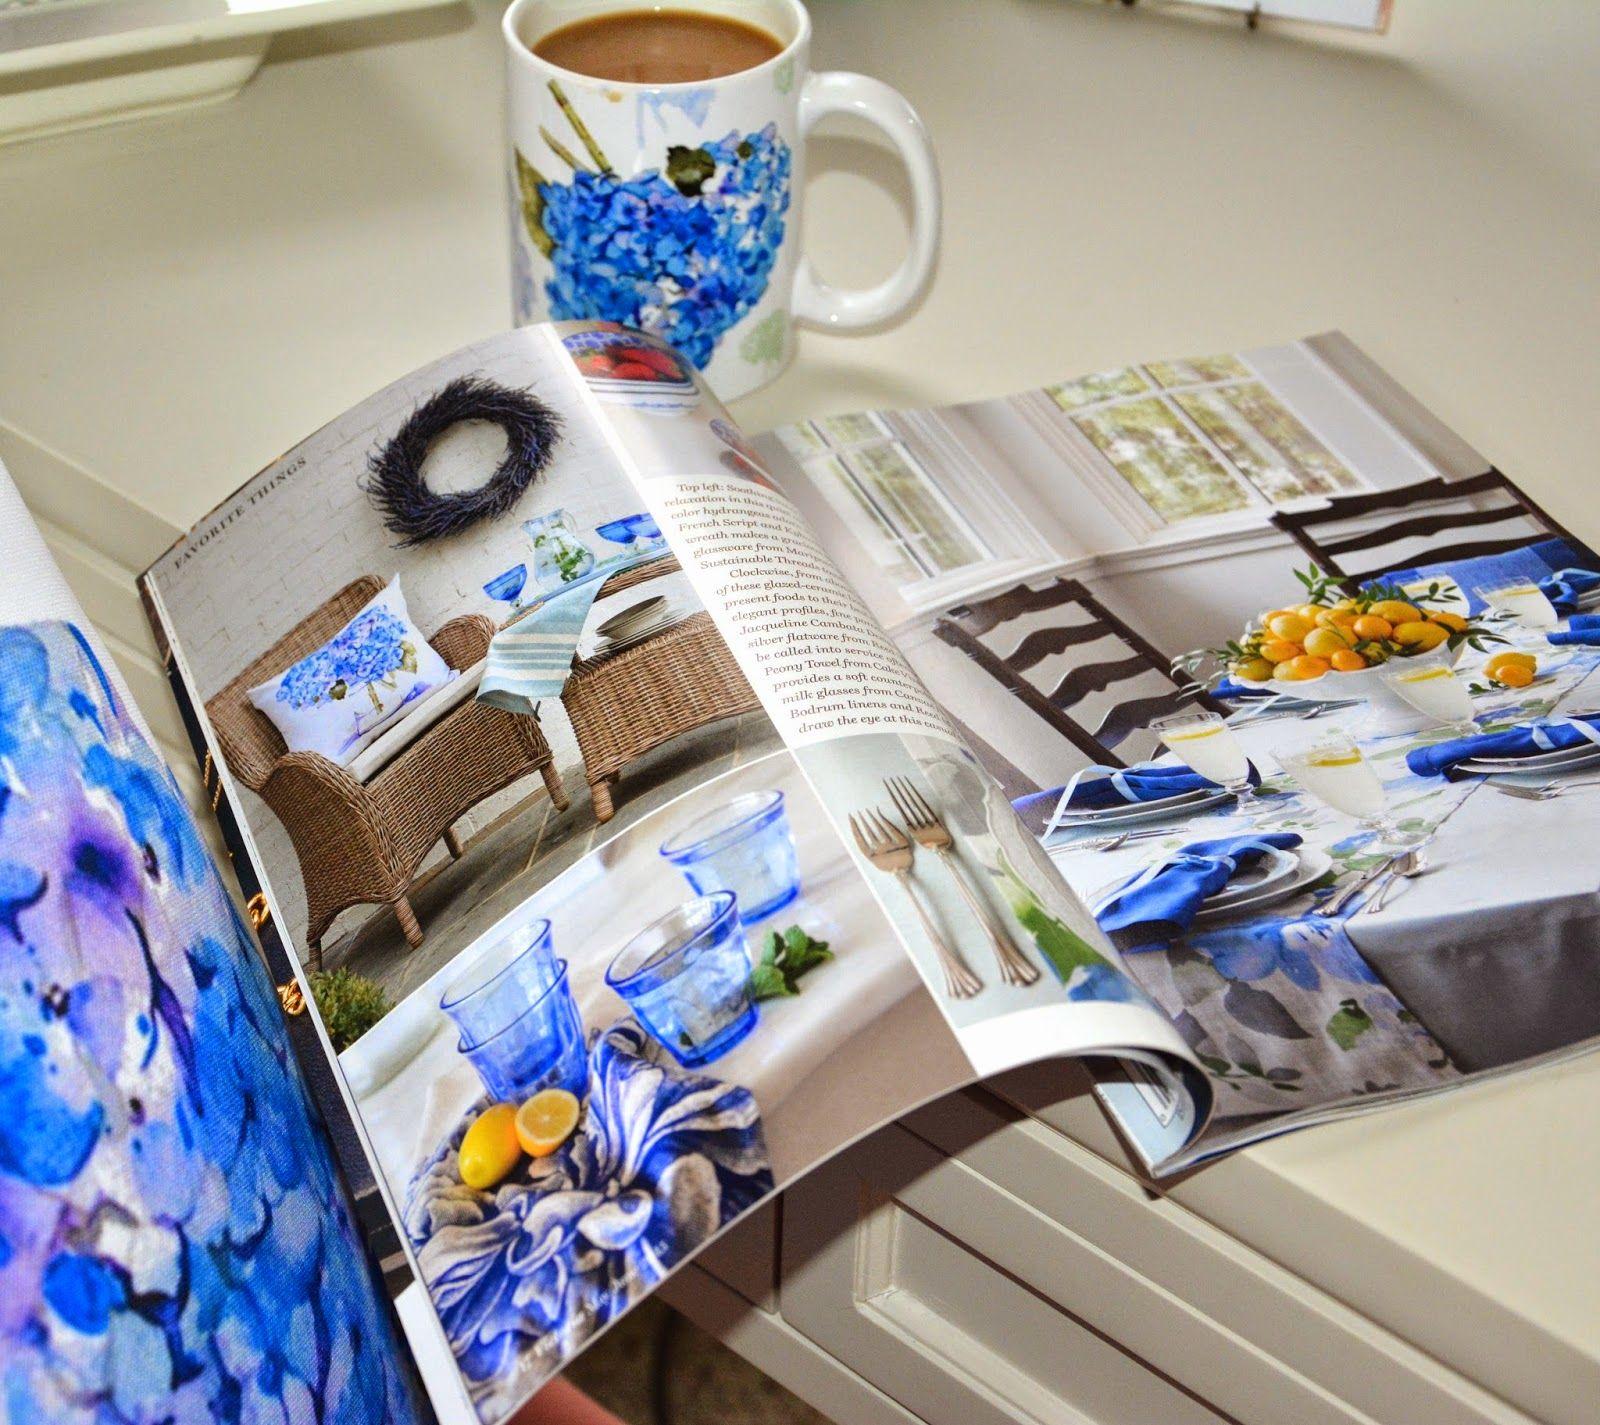 A SCRAPBOOK OF INSPIRATION: Dreamy Victoria Magazine & My Hydrangea pillow